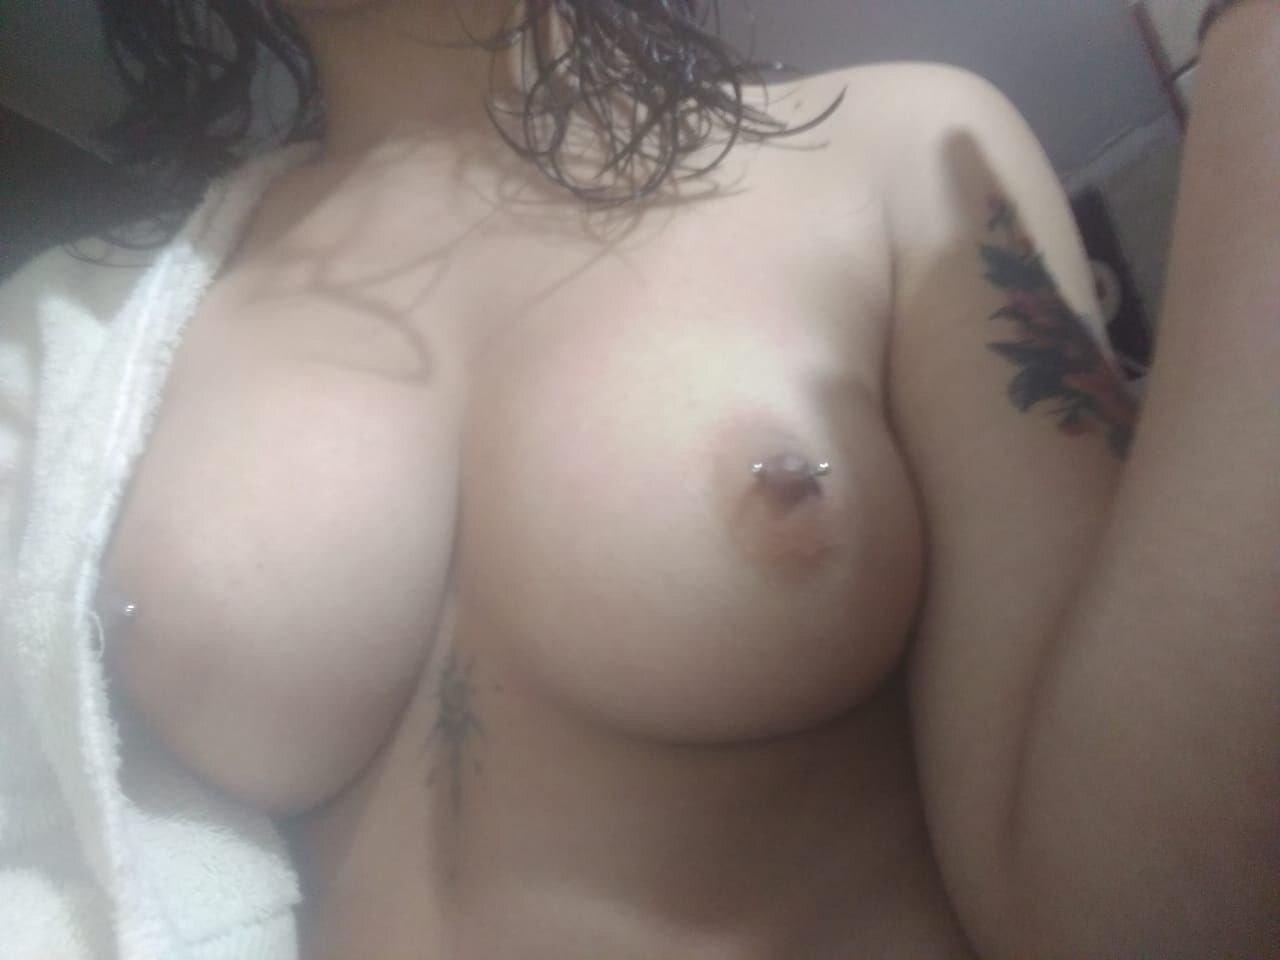 fotos onlyfans gratis, chicas onlyfans desnudas, packs fotos porno onlyfans